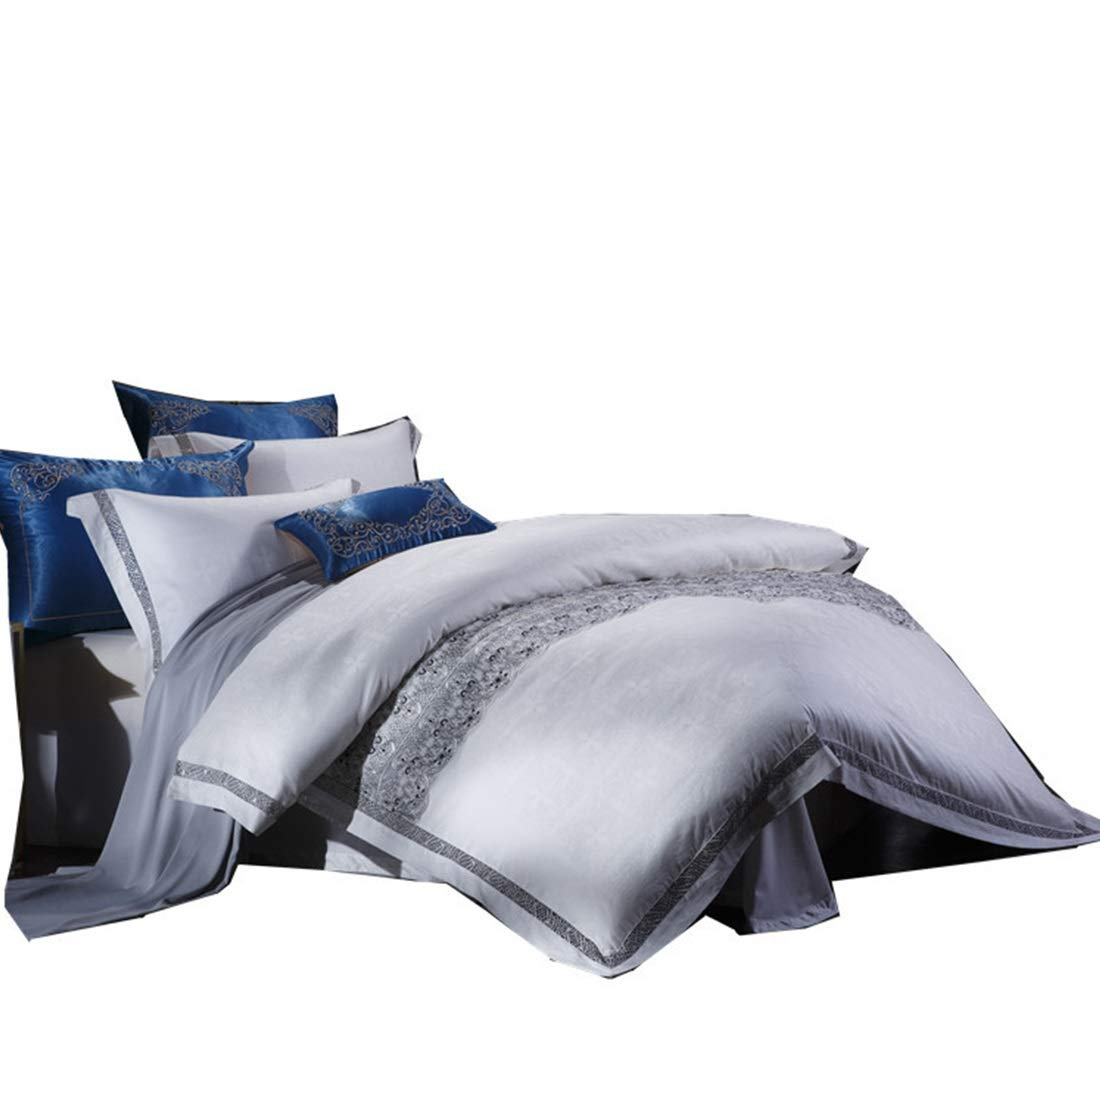 Kainuoo シンプルなレースピュアホワイトハイエンドピュアコットンサテンロングステープルコットン寝具4セット (Size : QUEEN) B07N82SXR2  Queen